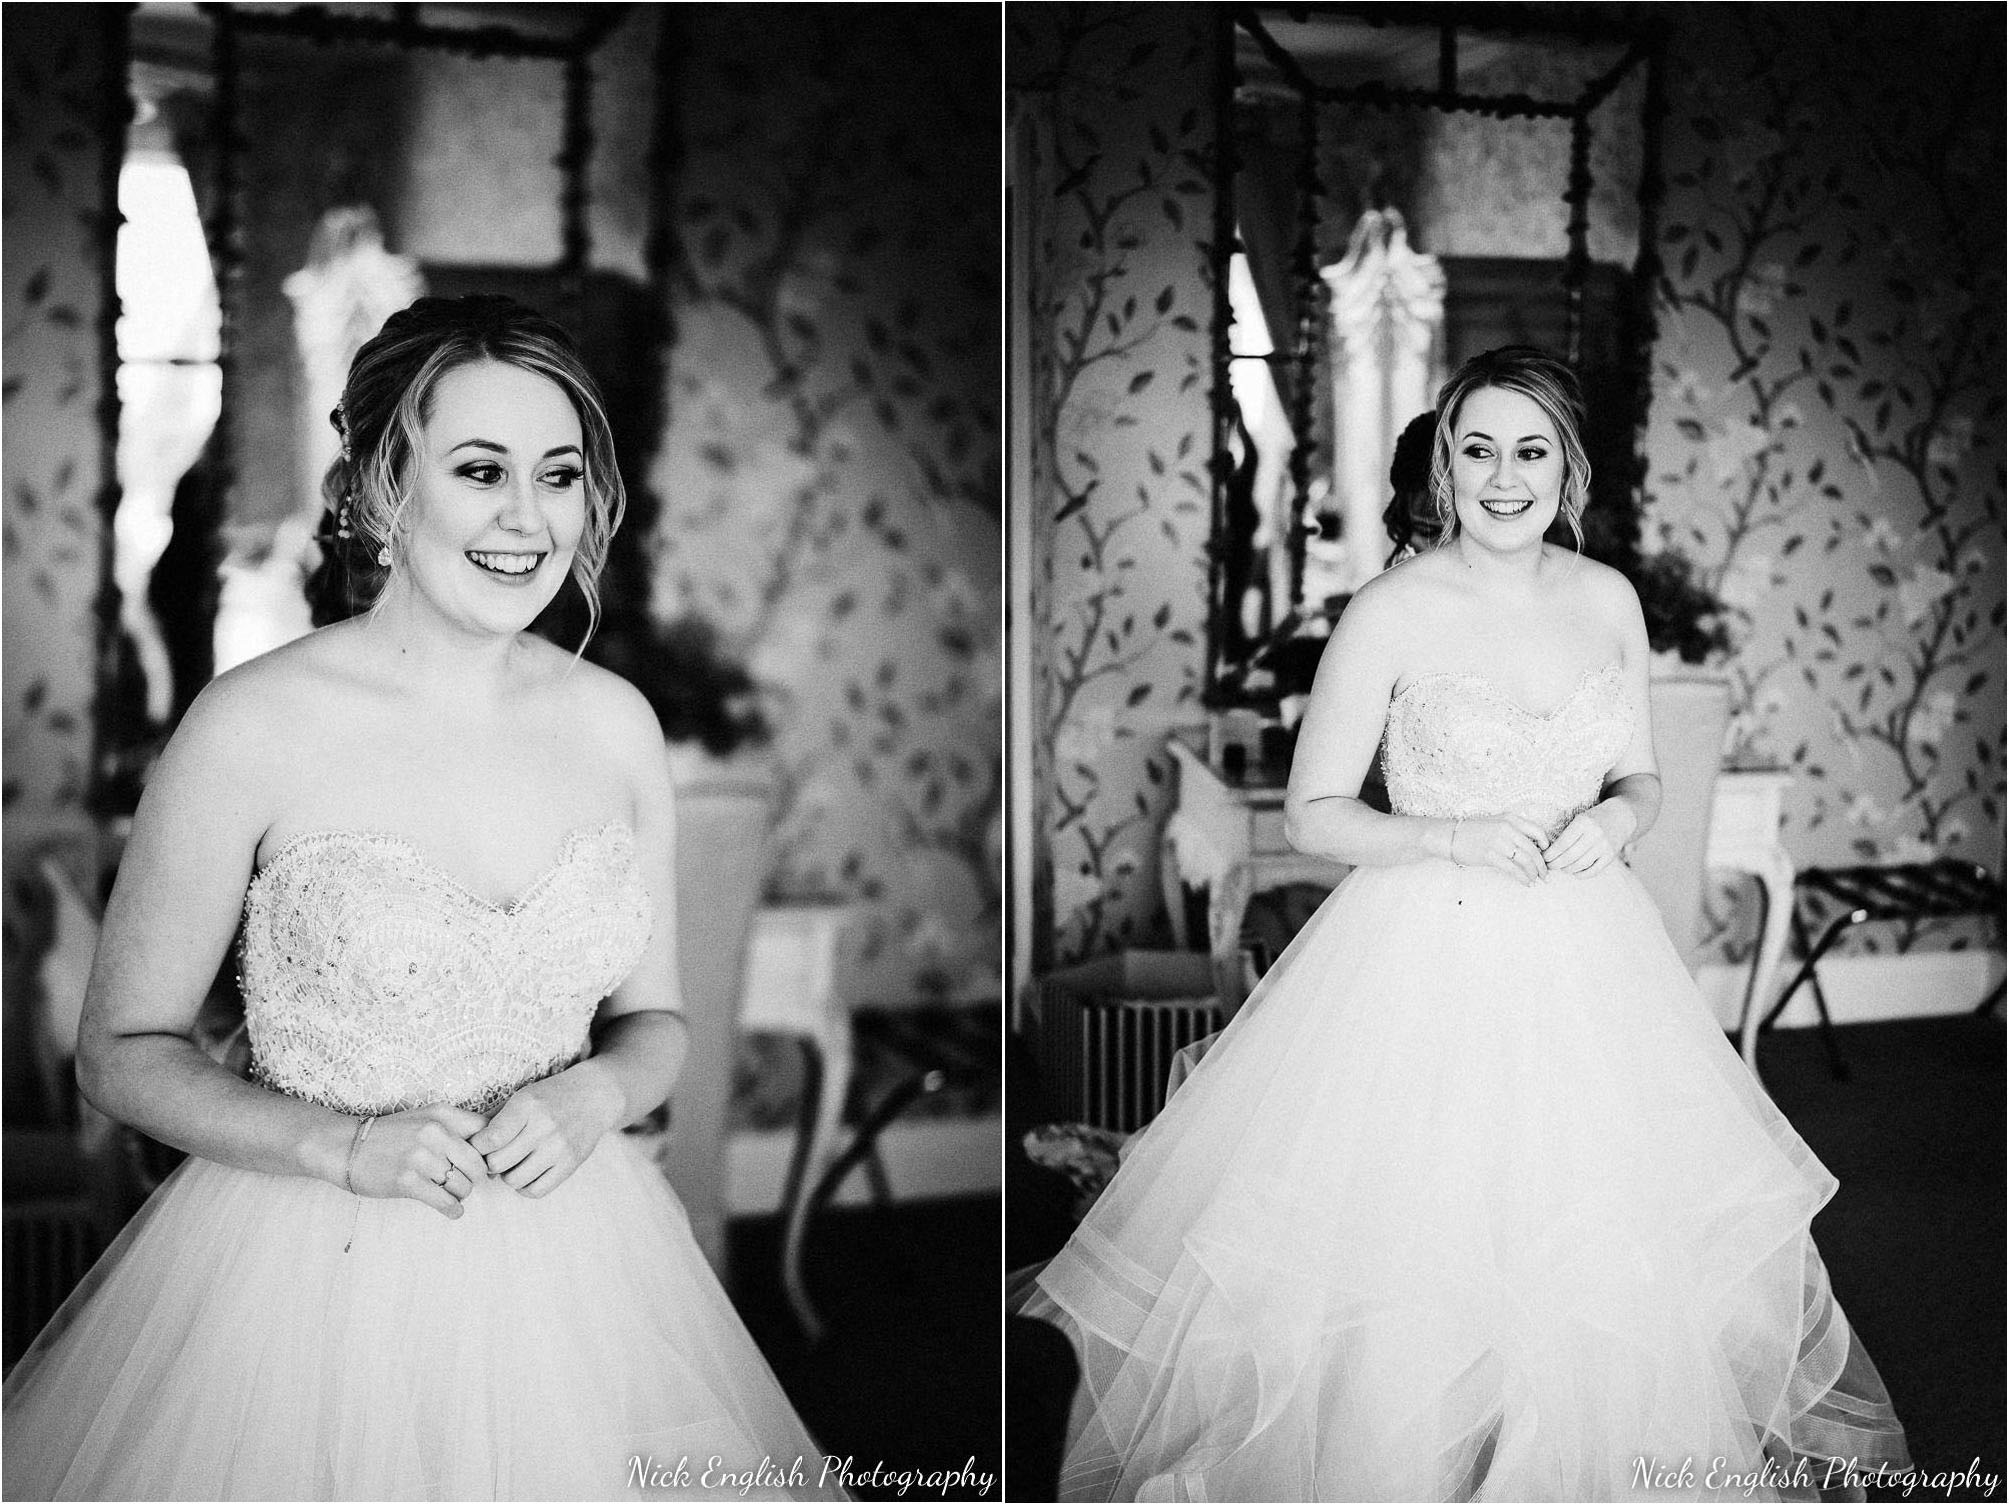 Eaves_Hall_Wedding_Photographer-20 copy.jpg